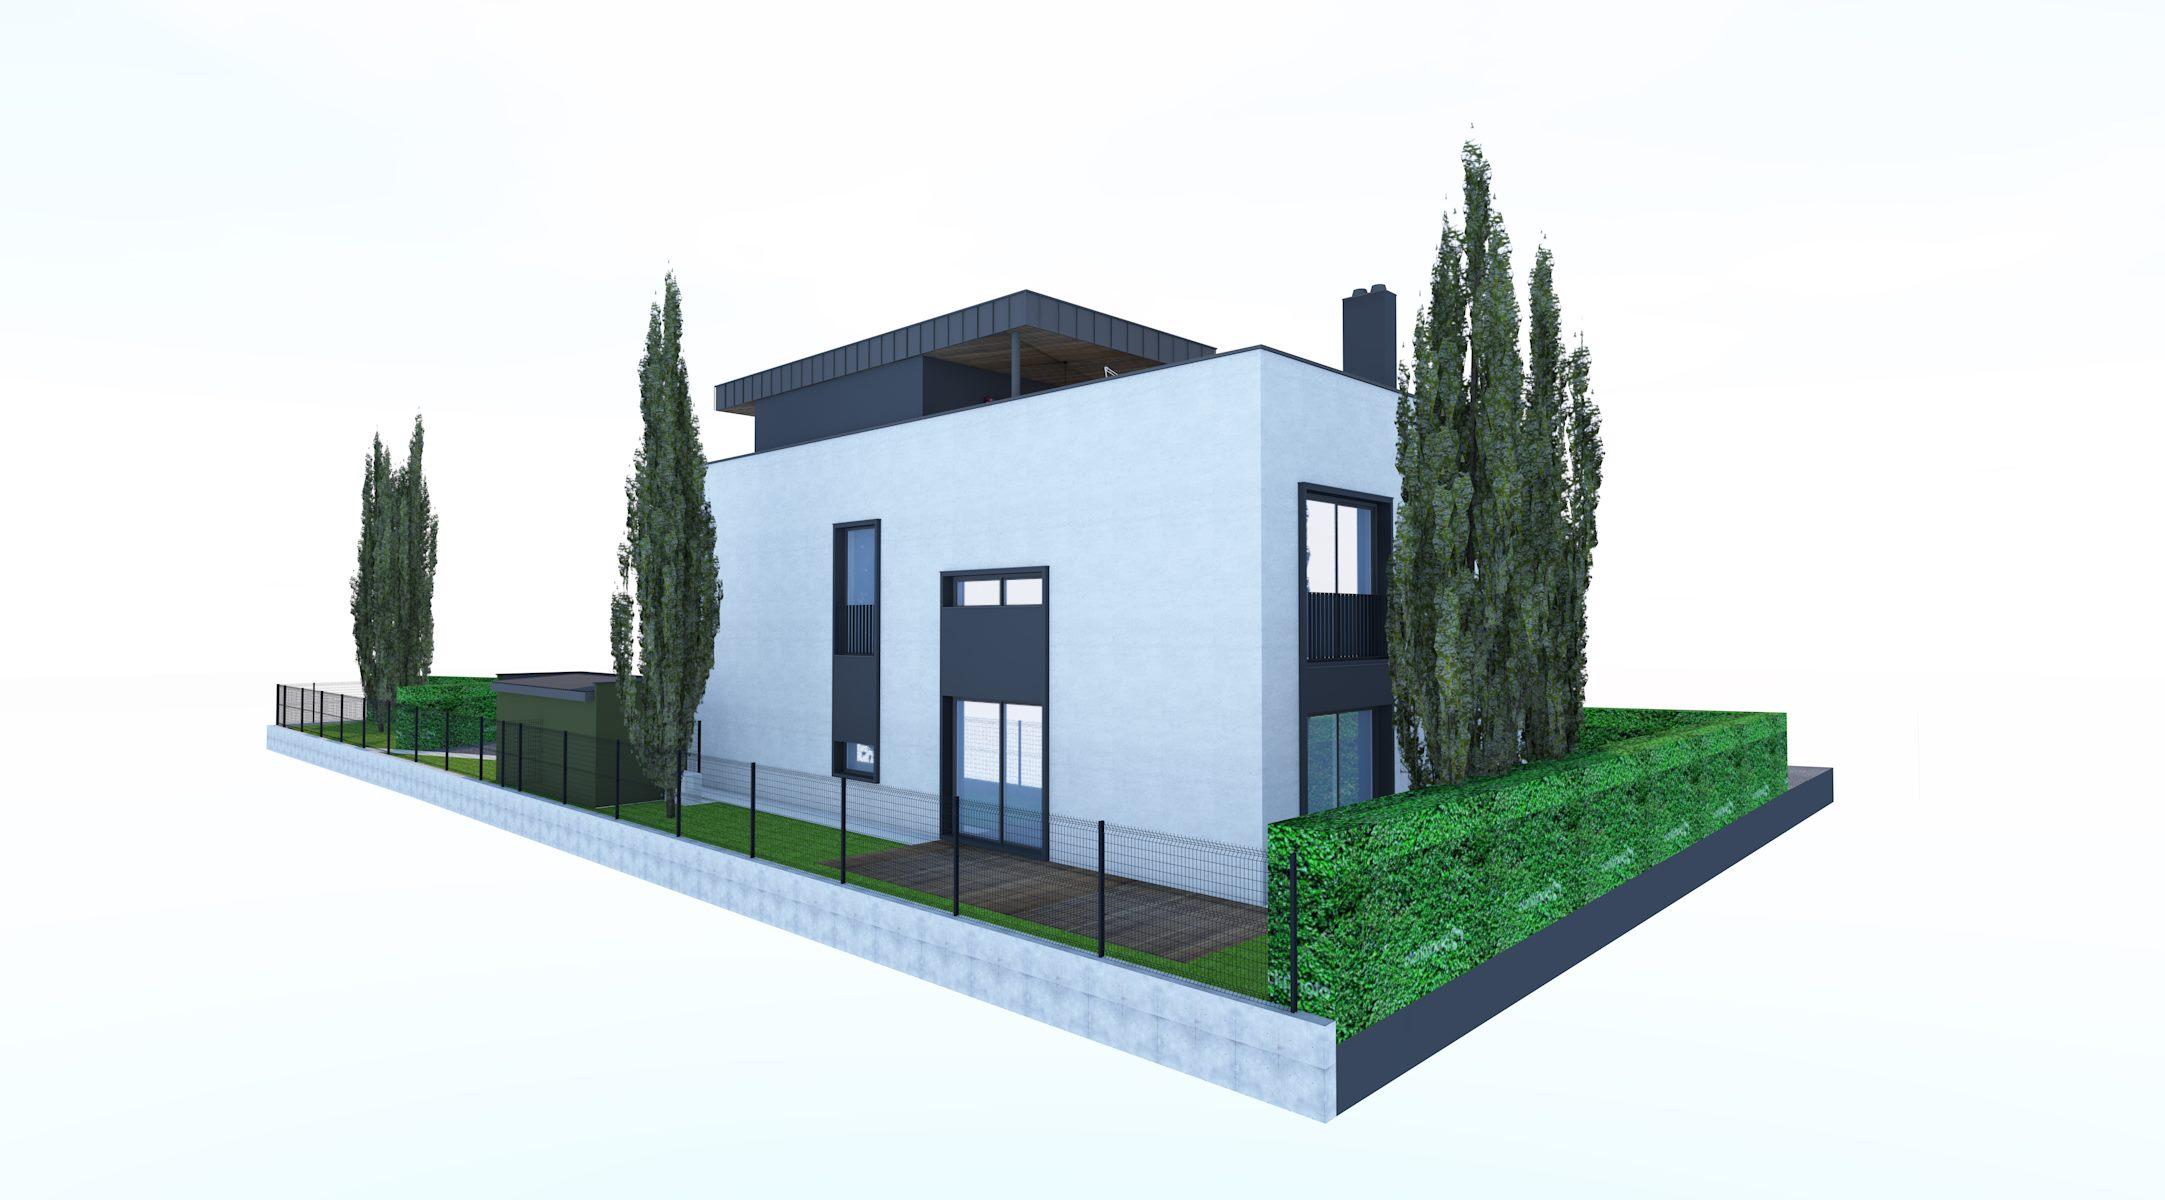 Novogradnja Vila blok Vižmarje-Brod 5